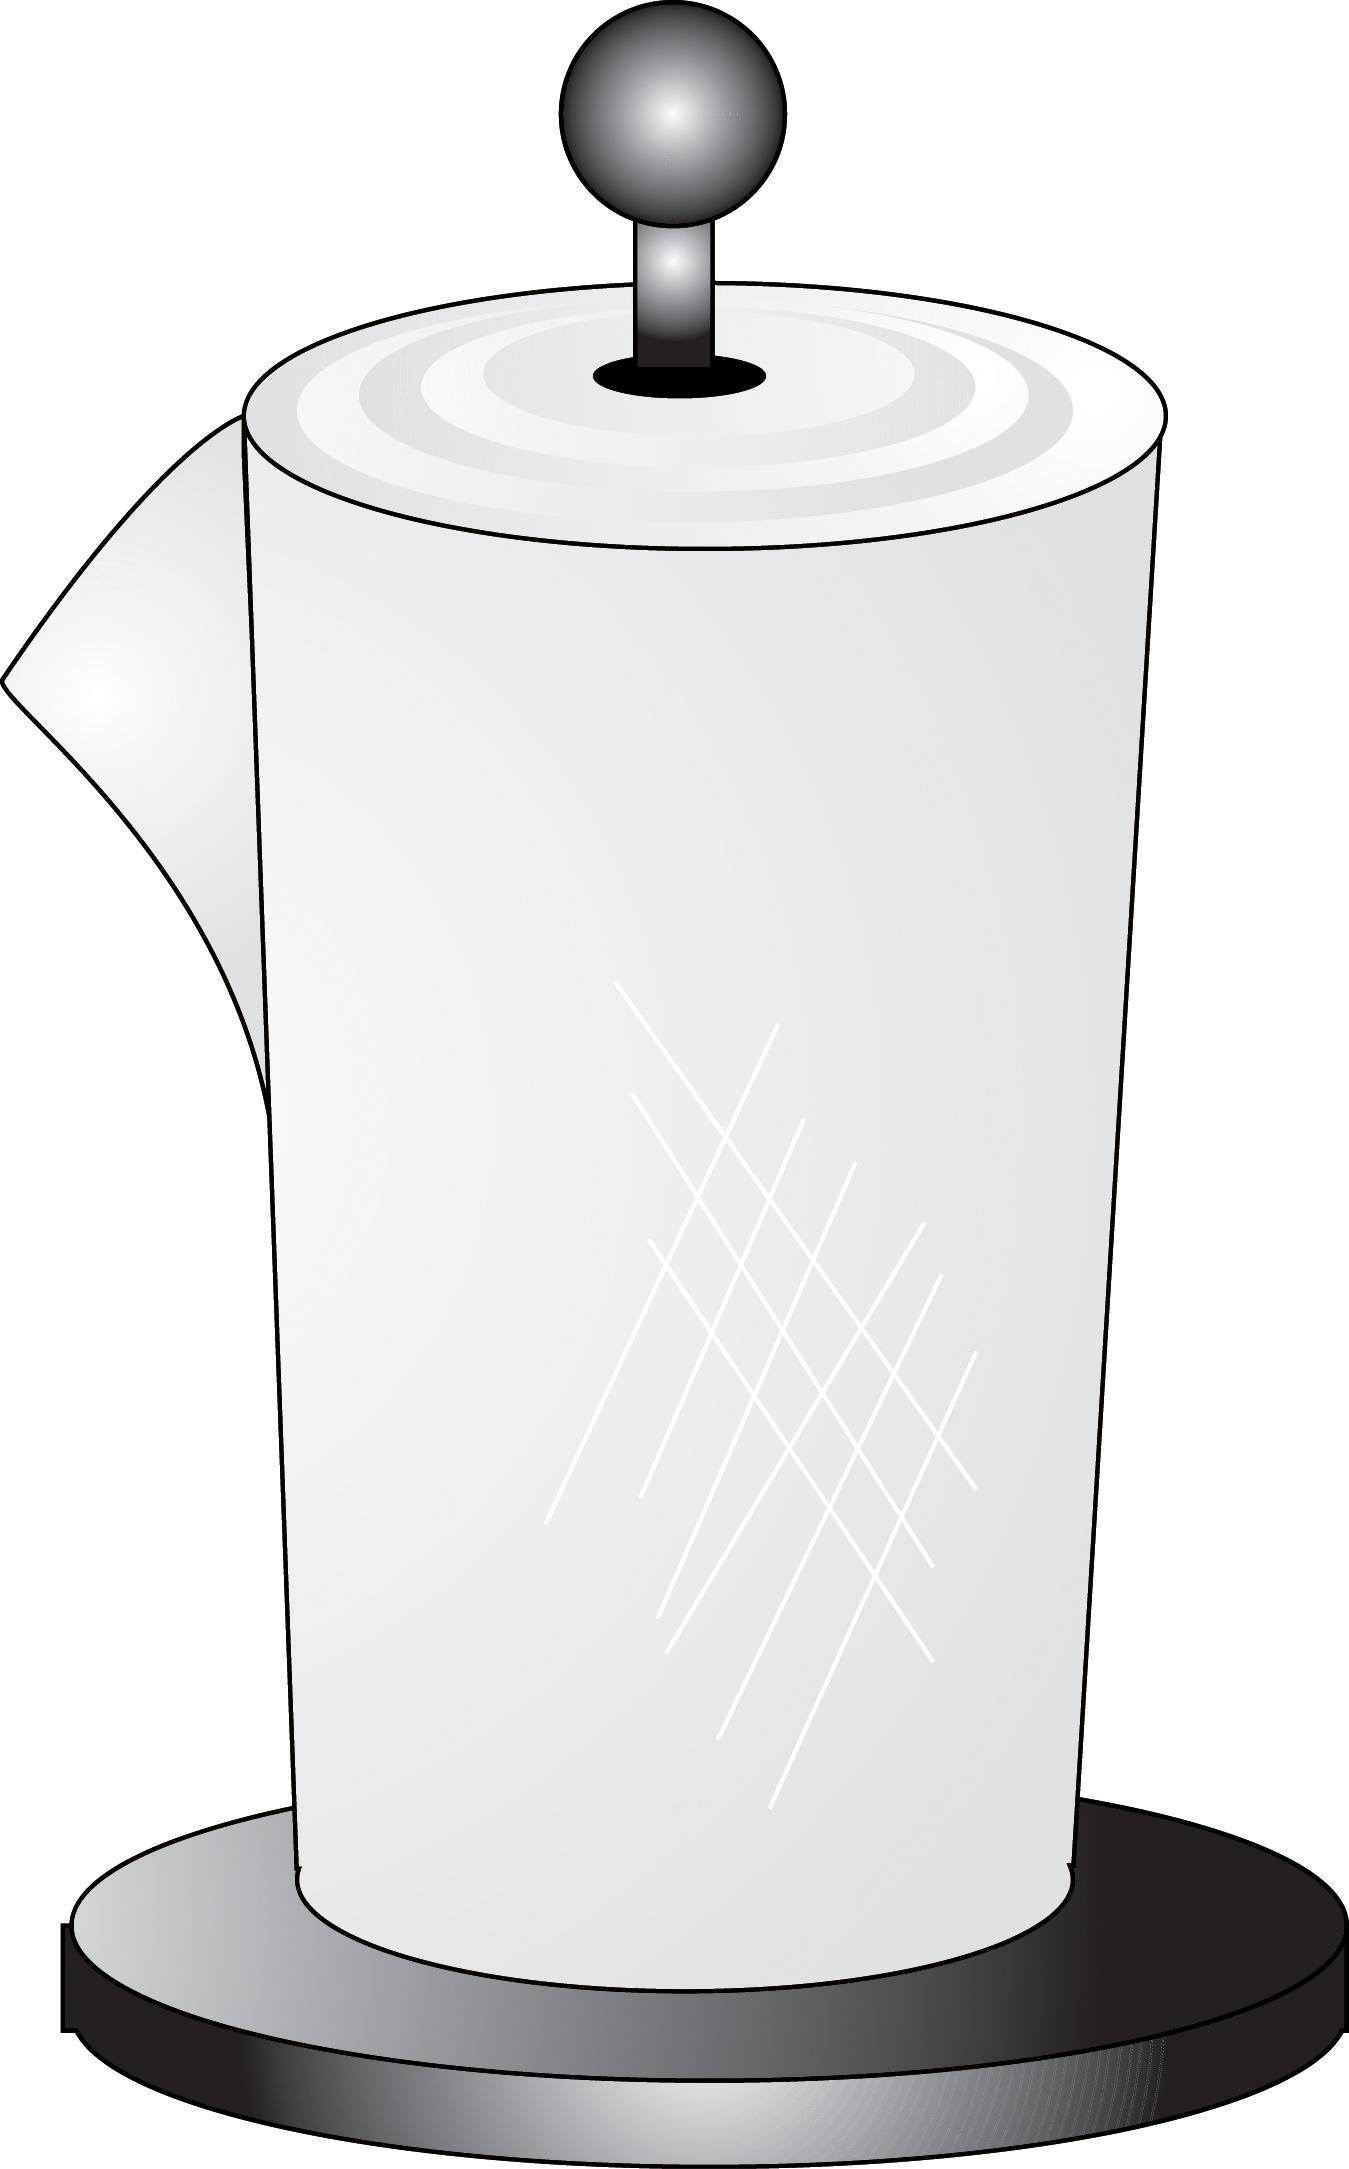 Paper Towel Clipart Clipart Suggest